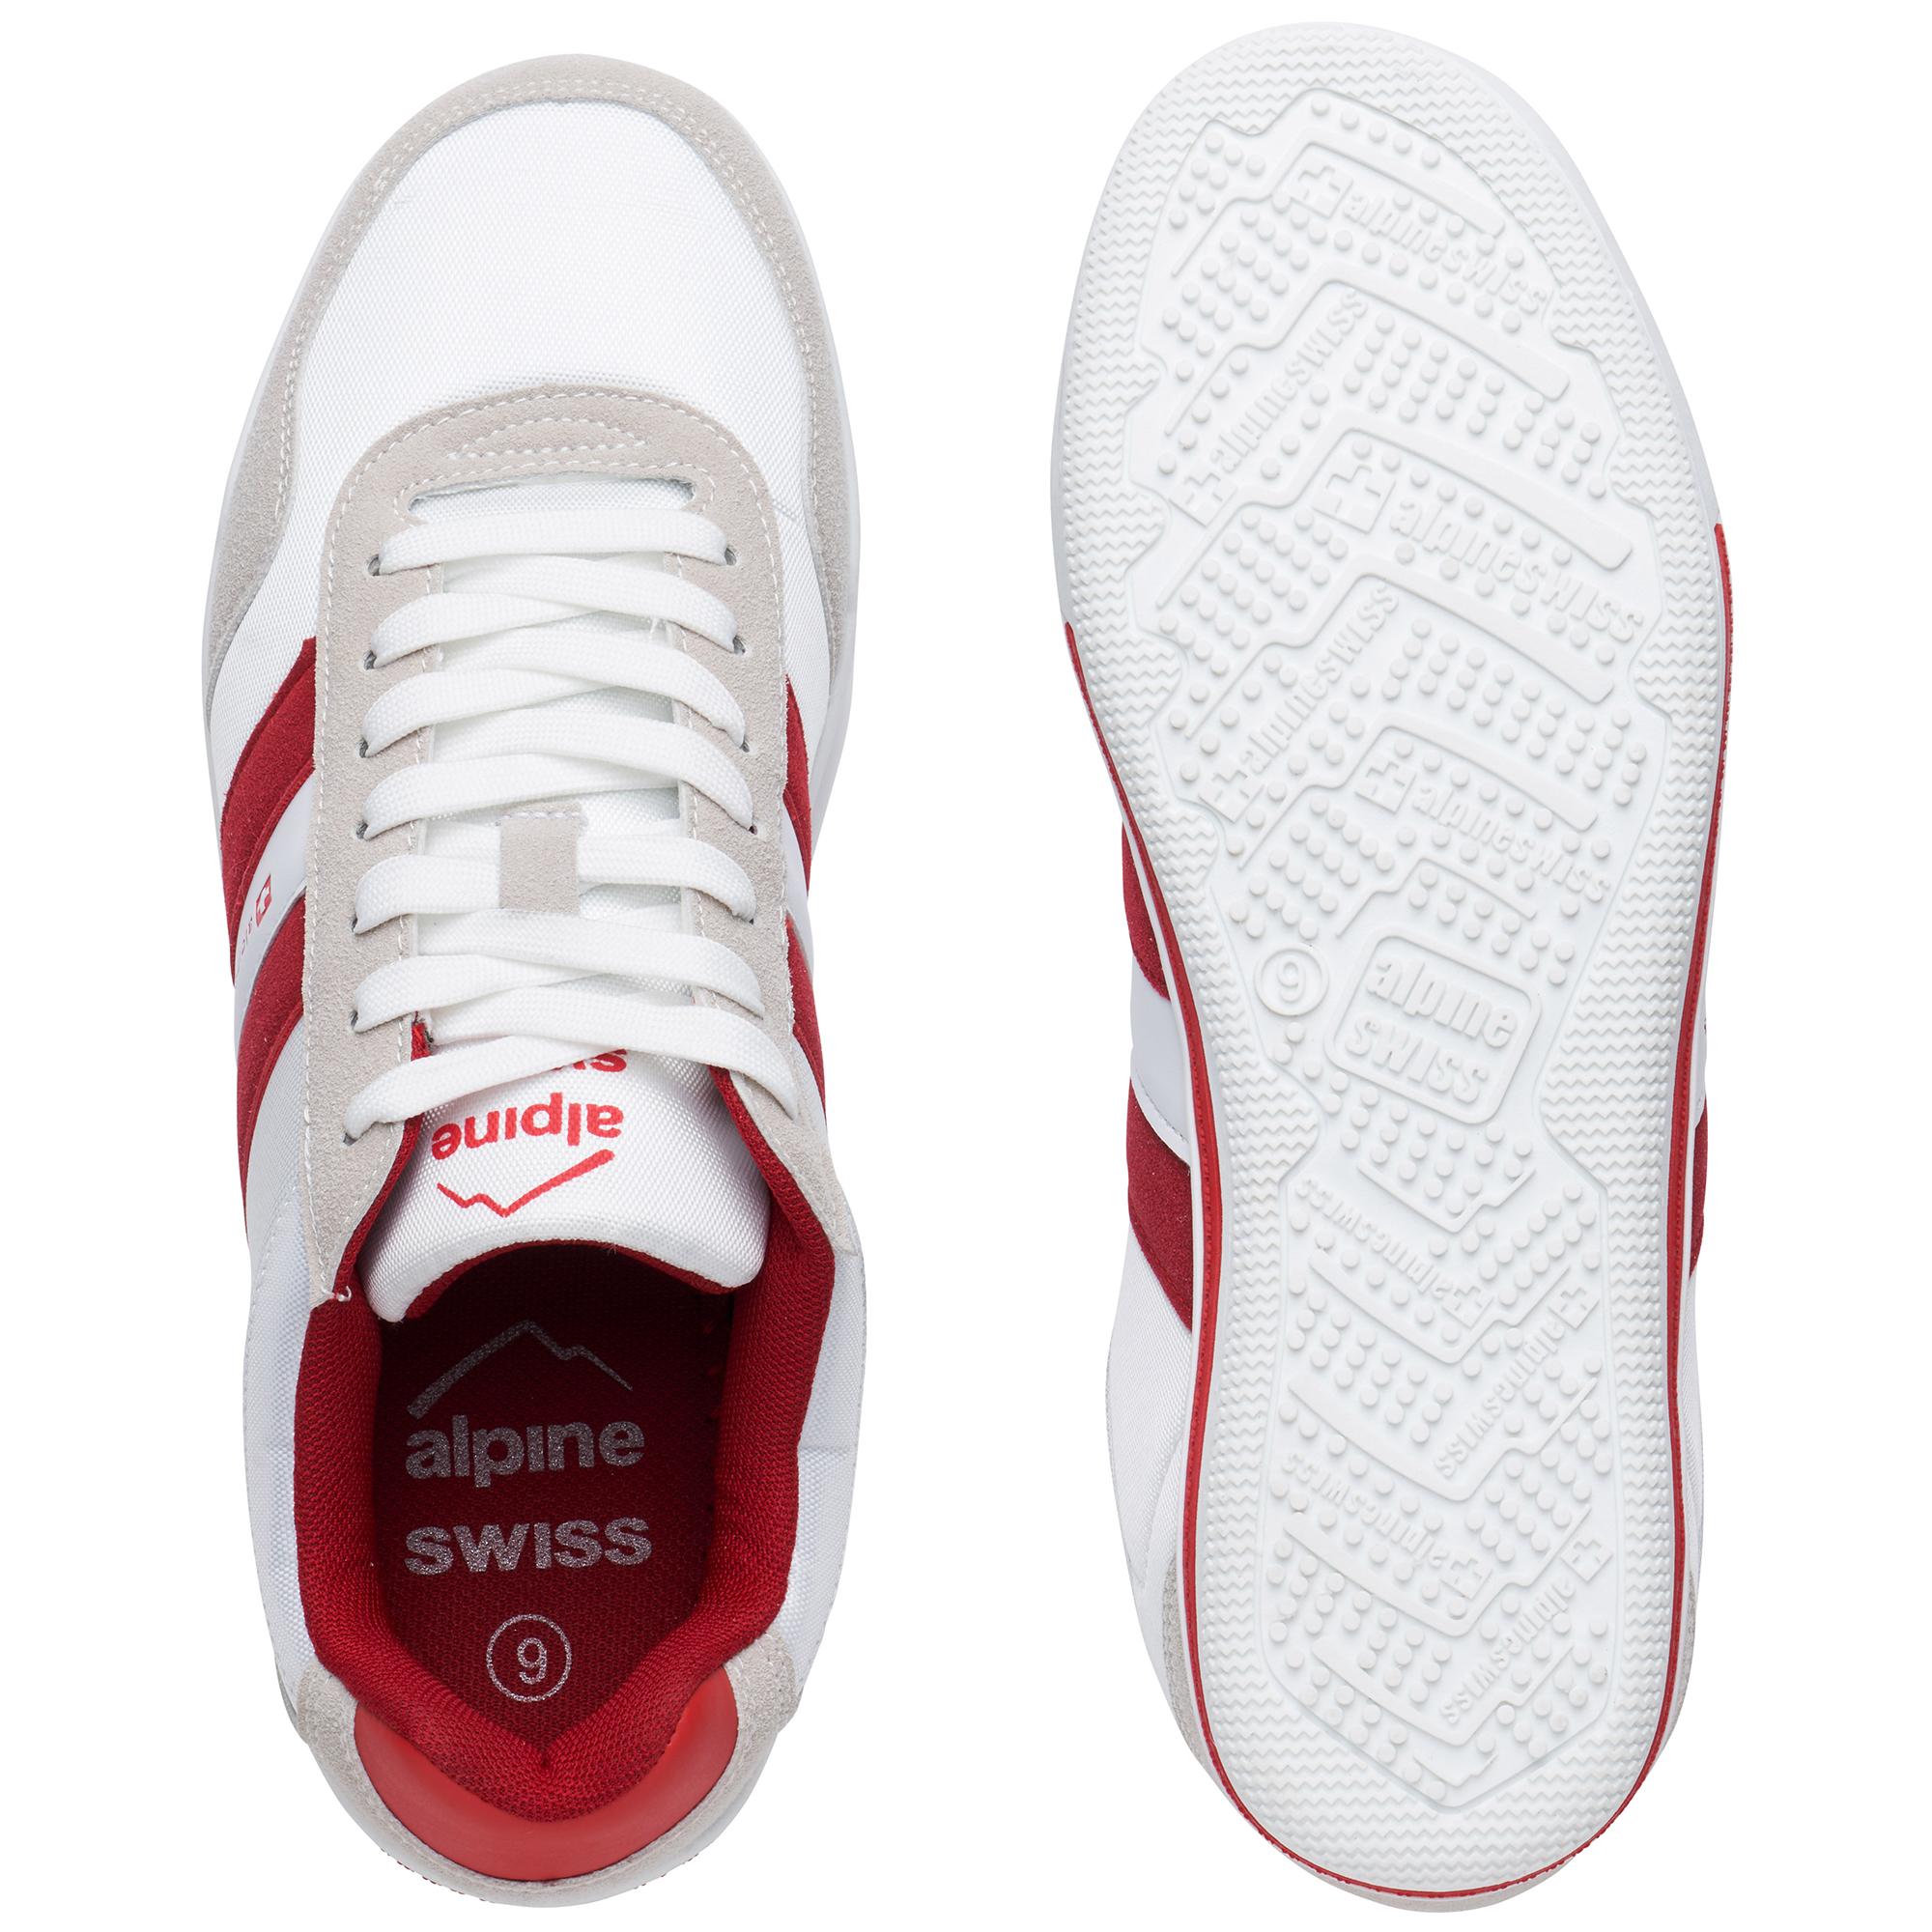 Alpine-Swiss-Haris-Mens-Retro-Striped-Athletic-Shoes-Fashion-Sneaker-Tennis-Shoe thumbnail 16